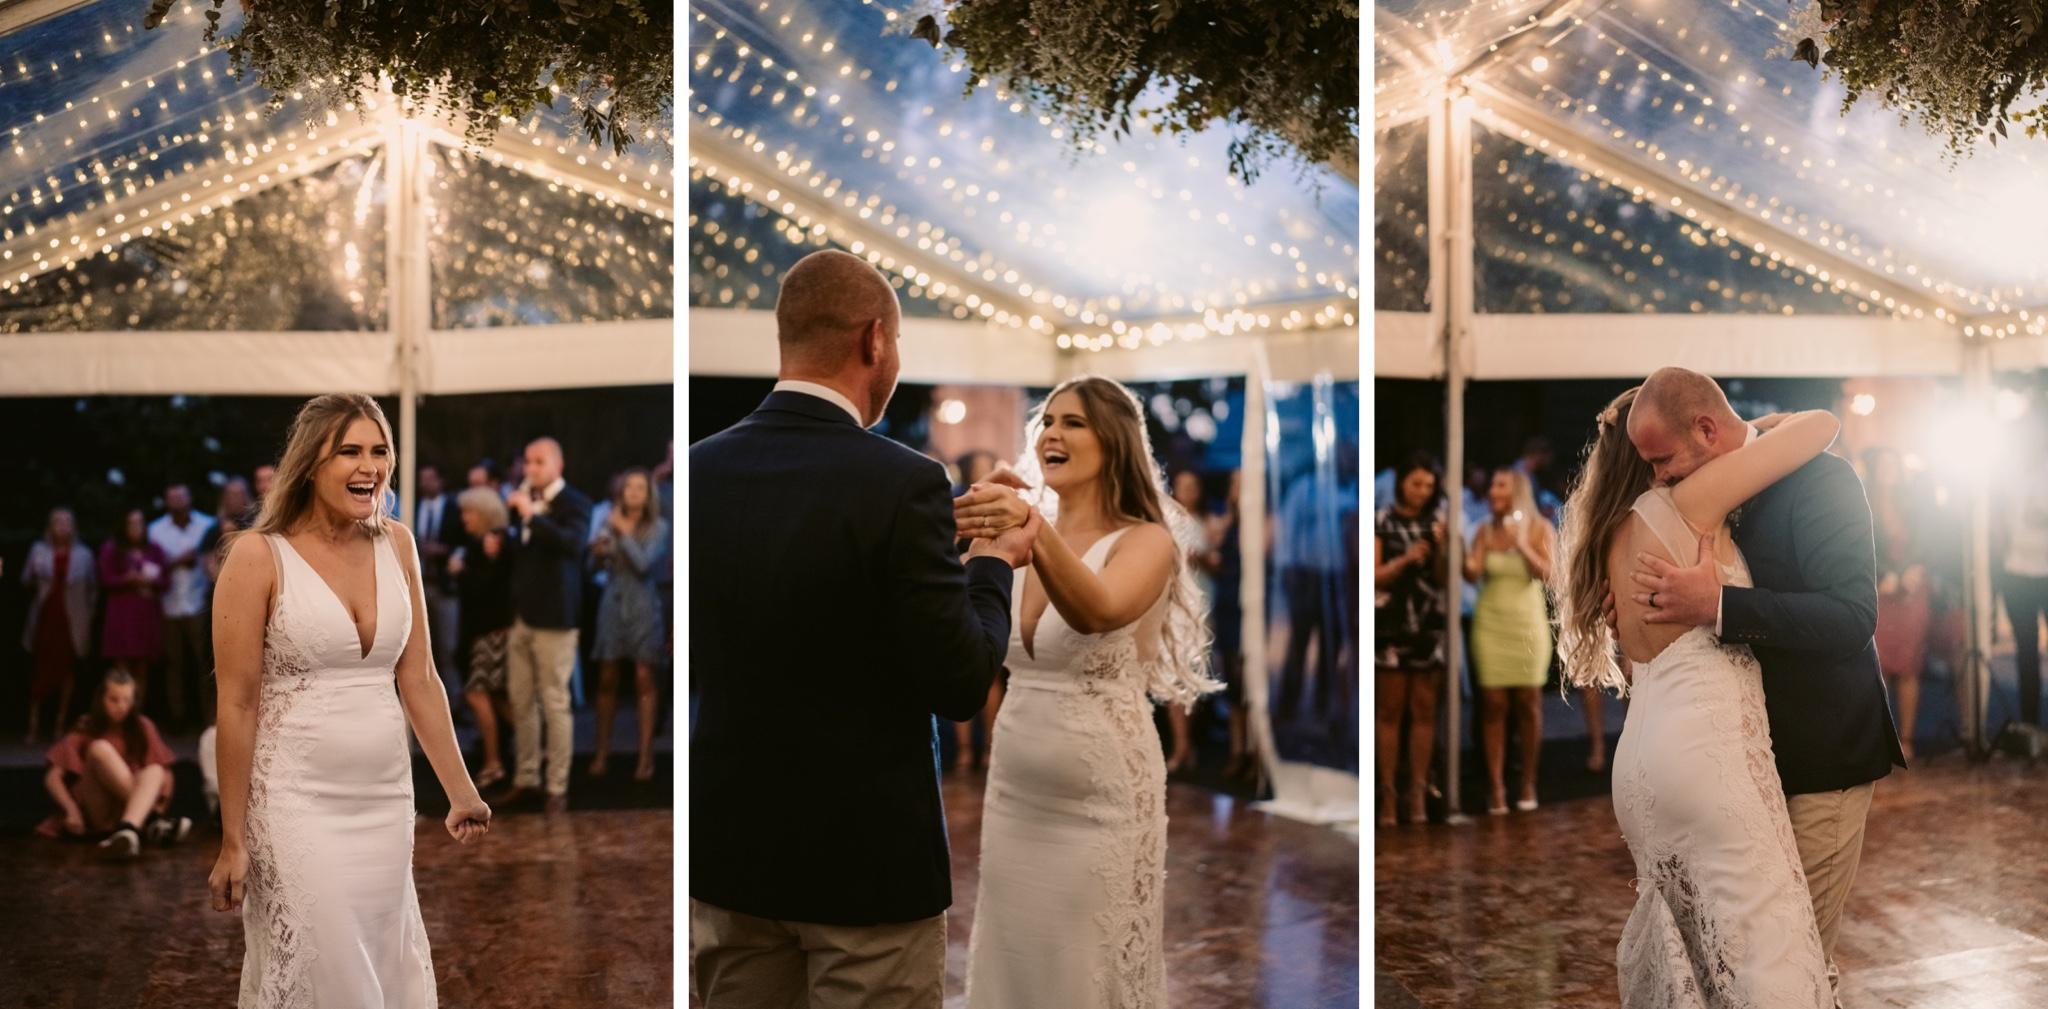 Mornington Peninsula Wedding Photography92.jpg